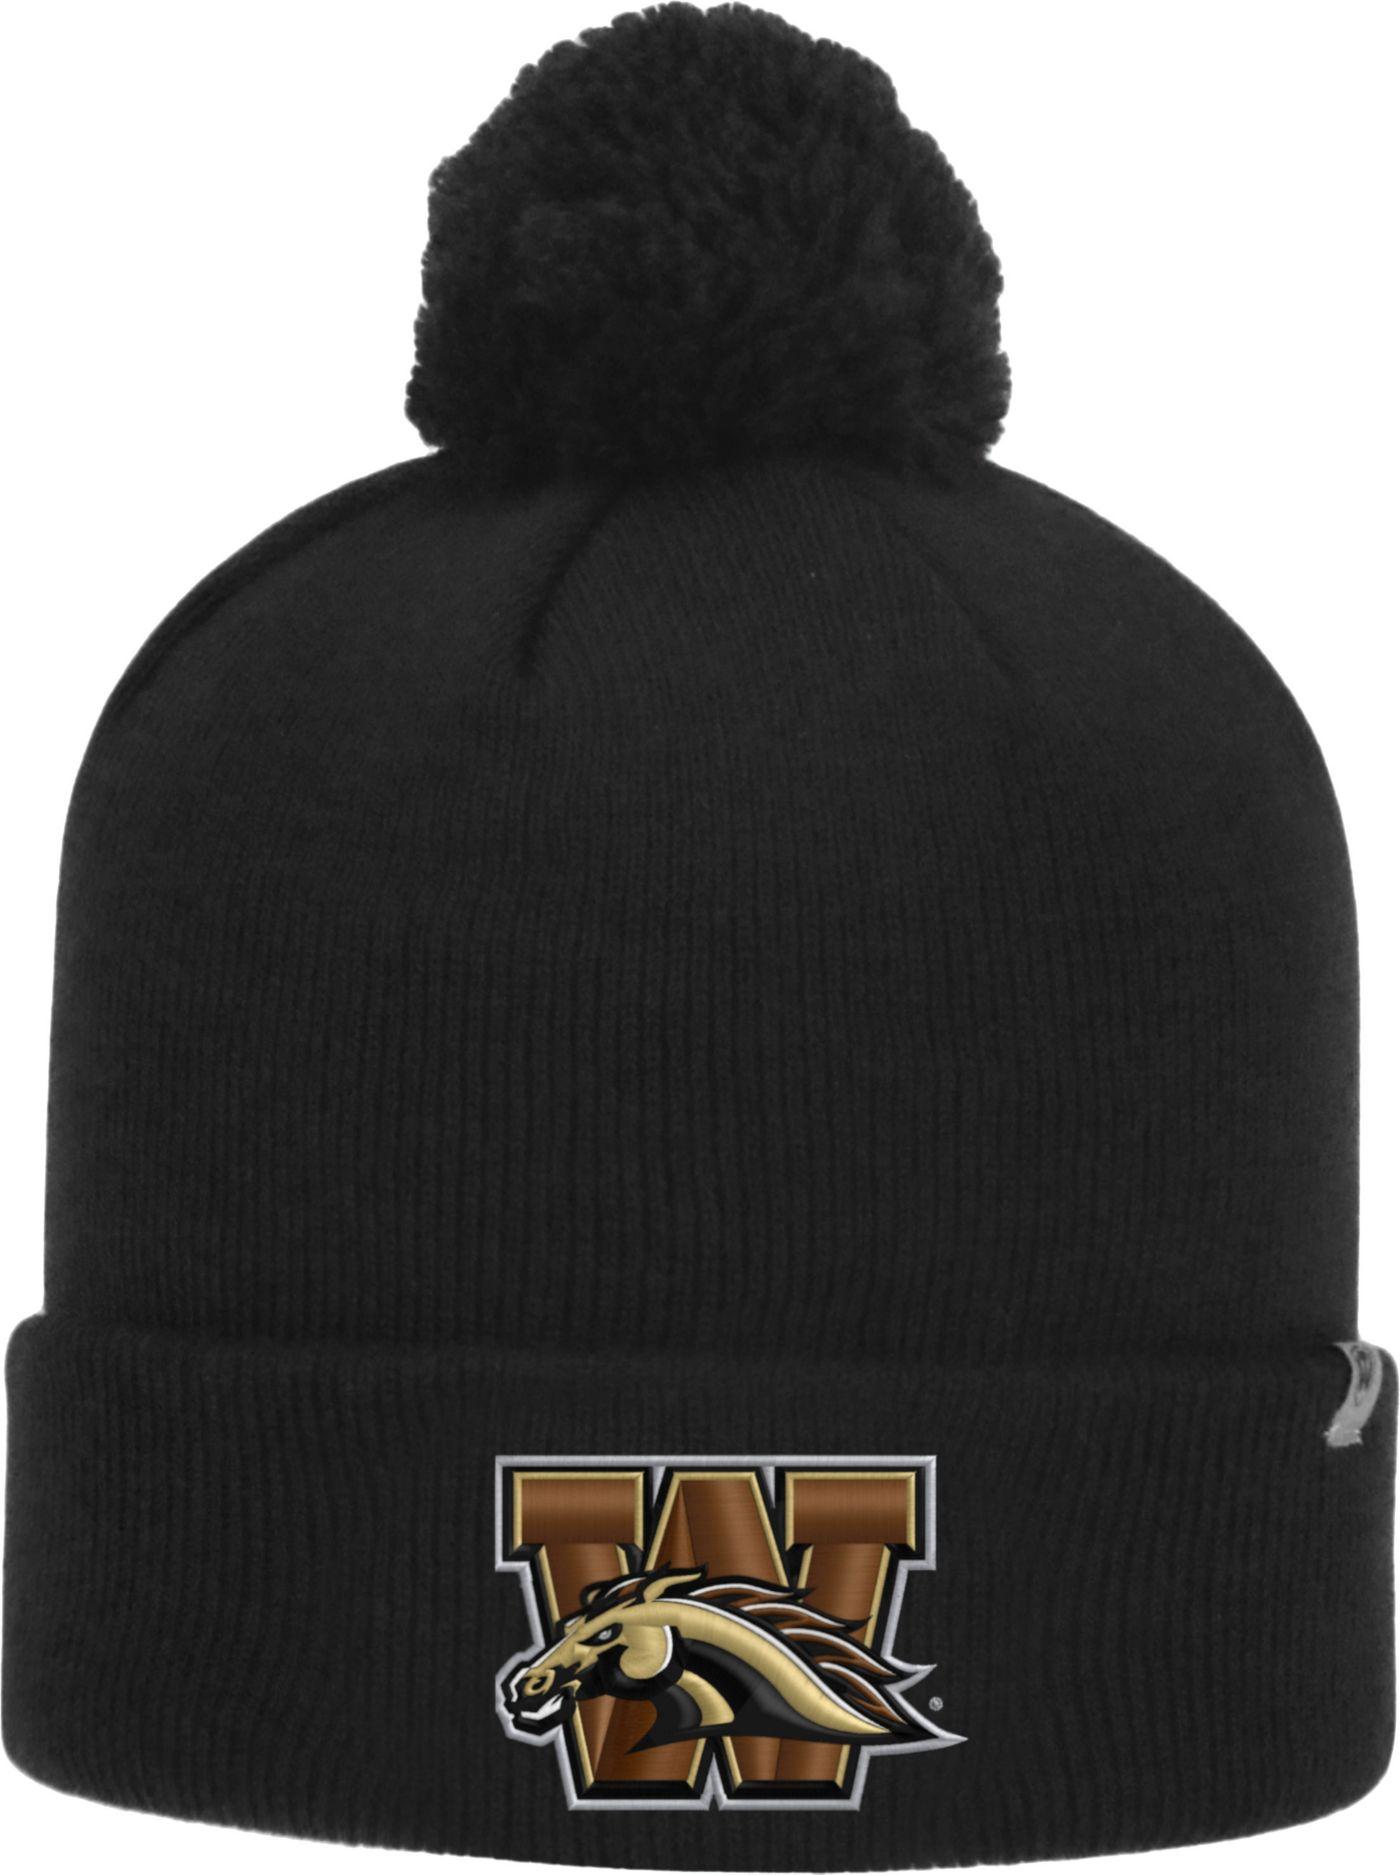 Top of the World Men's Western Michigan Broncos Black Pom Knit Beanie